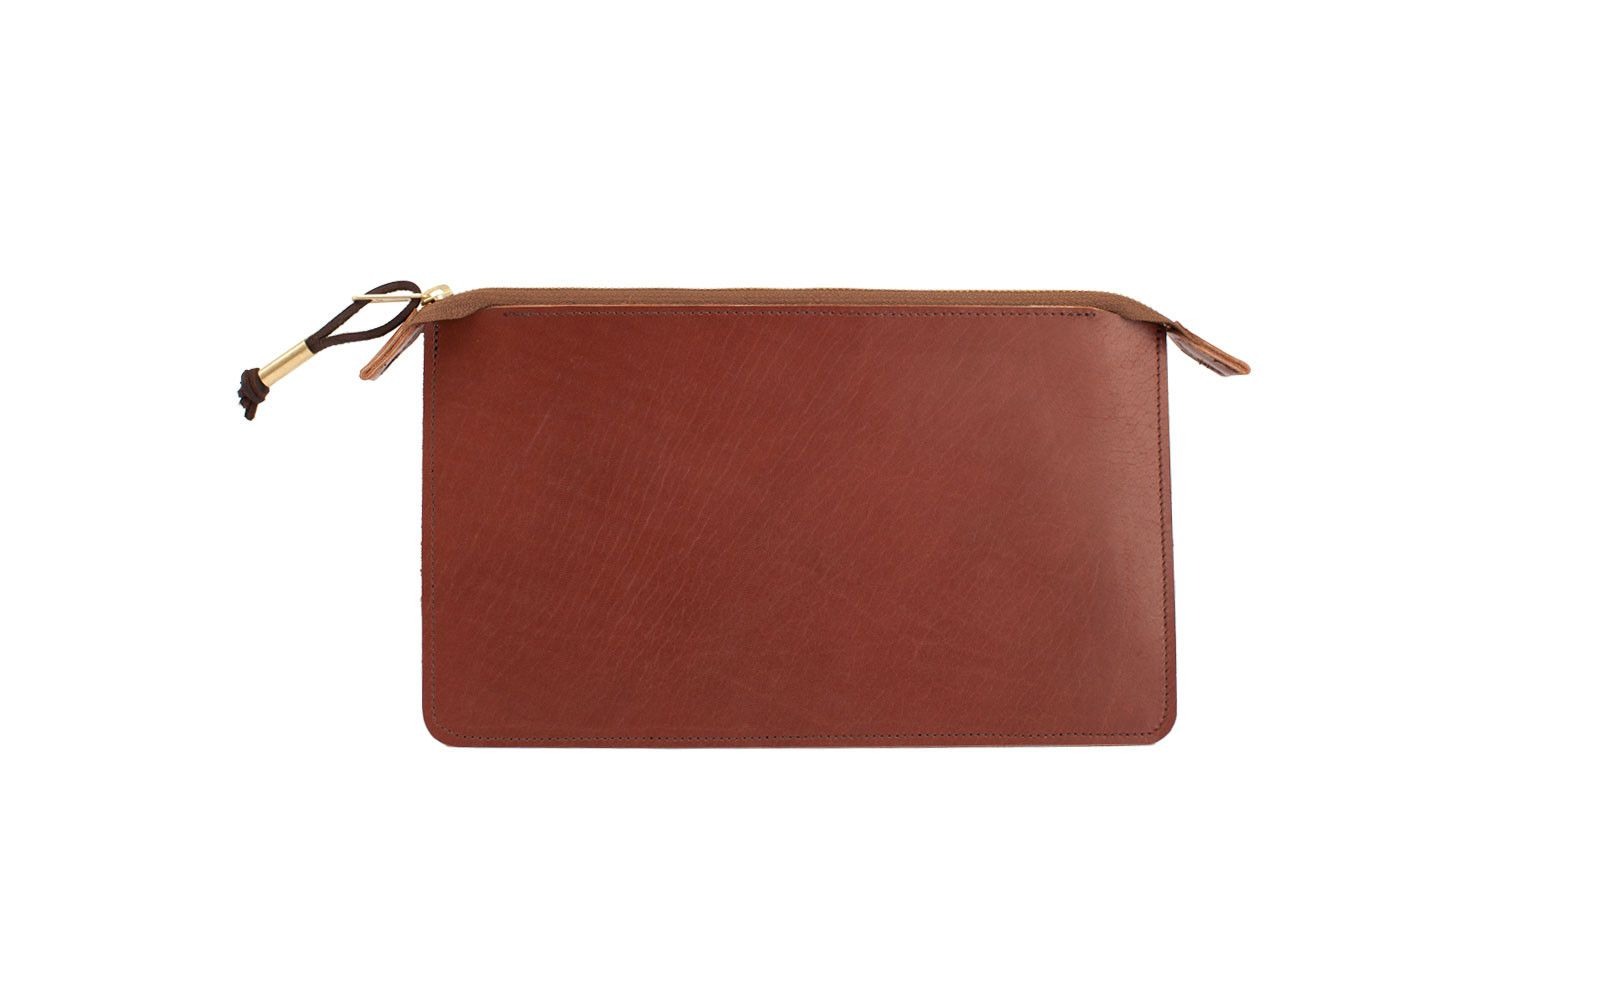 Leather Clutch in Brown by Joshu+Vela